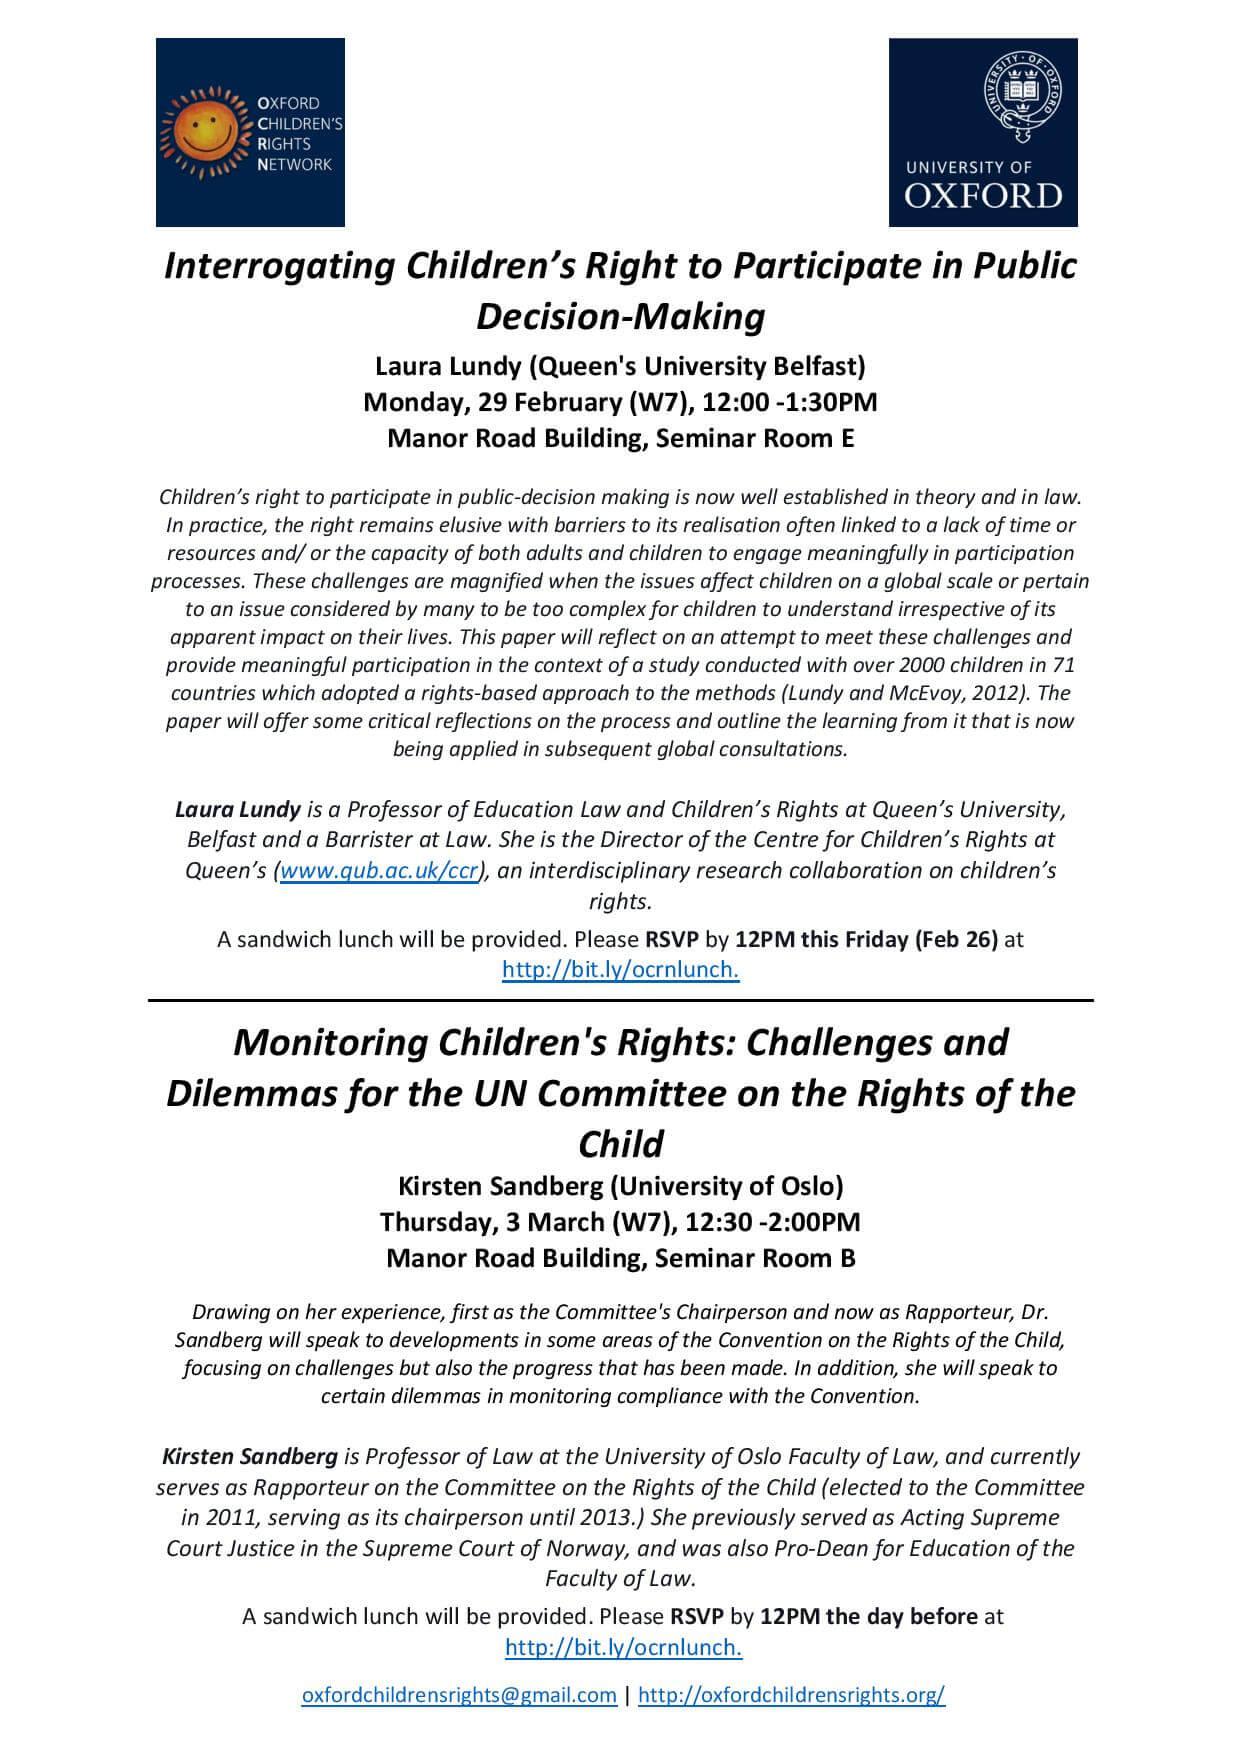 Oxford Children's Rights Network-Upcoming Seminars